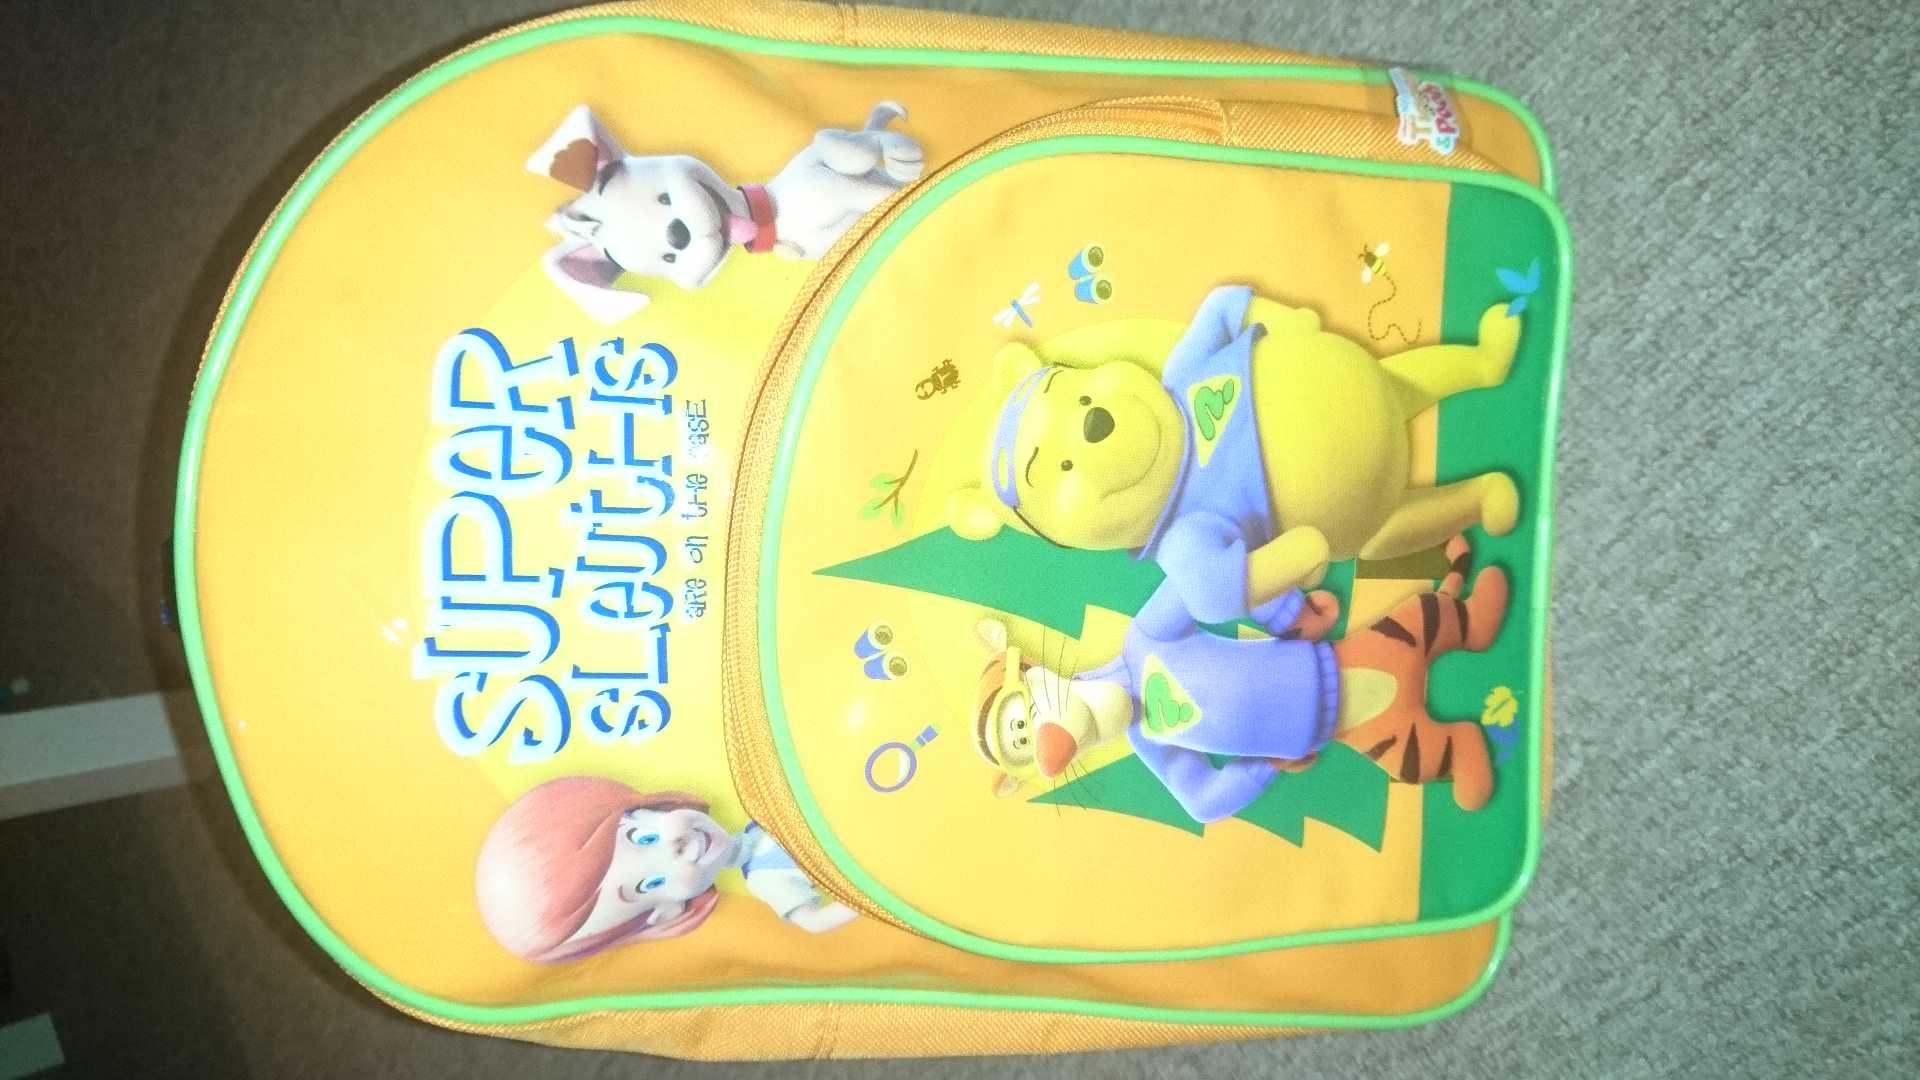 Tigger and pooh backpack